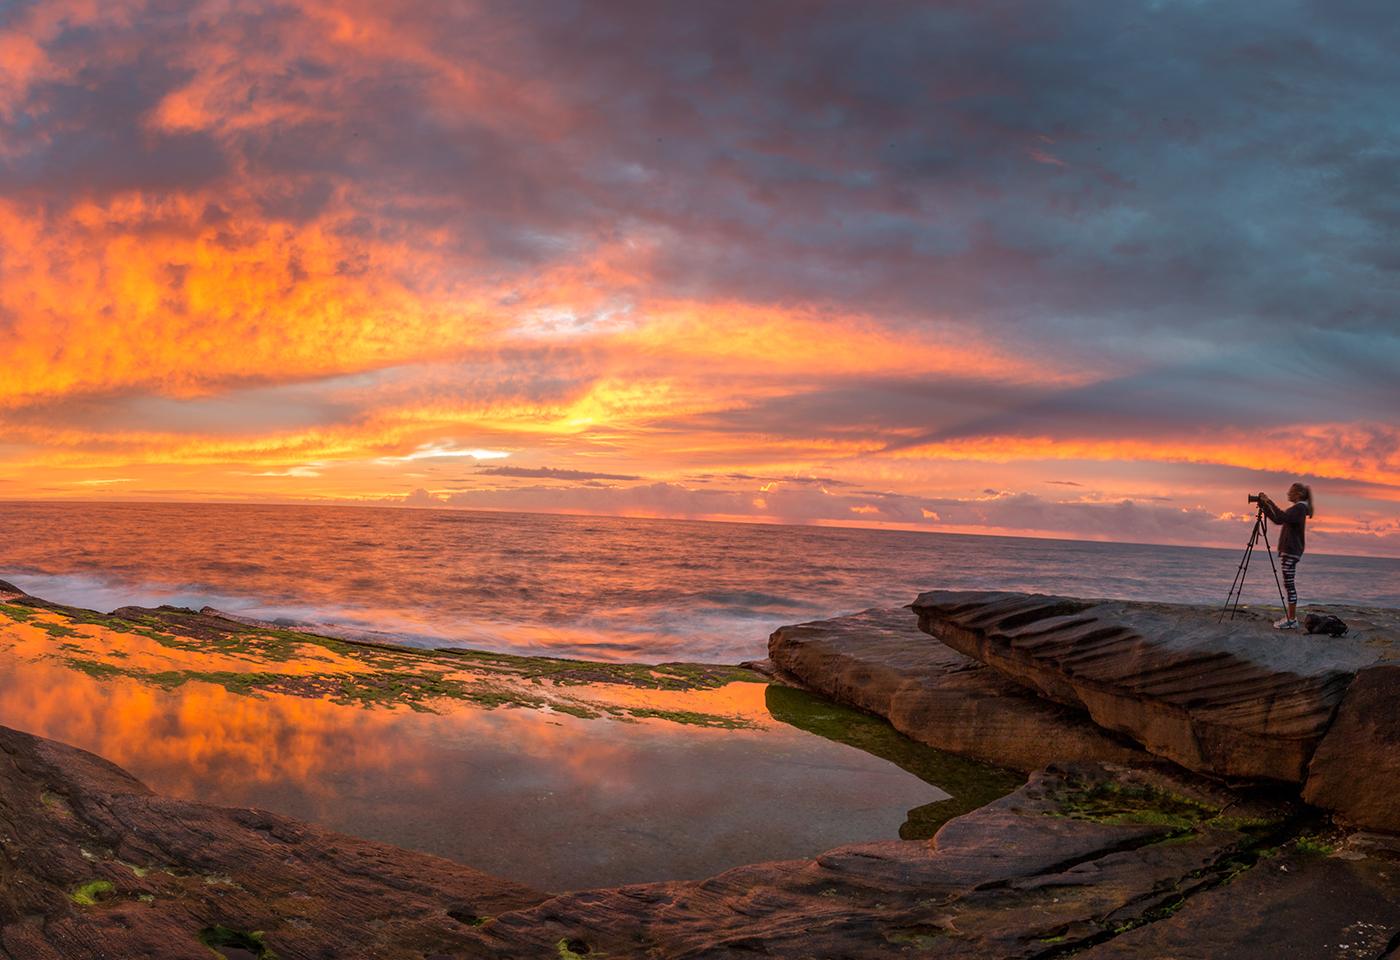 Panoramic image of sunrise at Freshwater Beach by Jenn Coooper